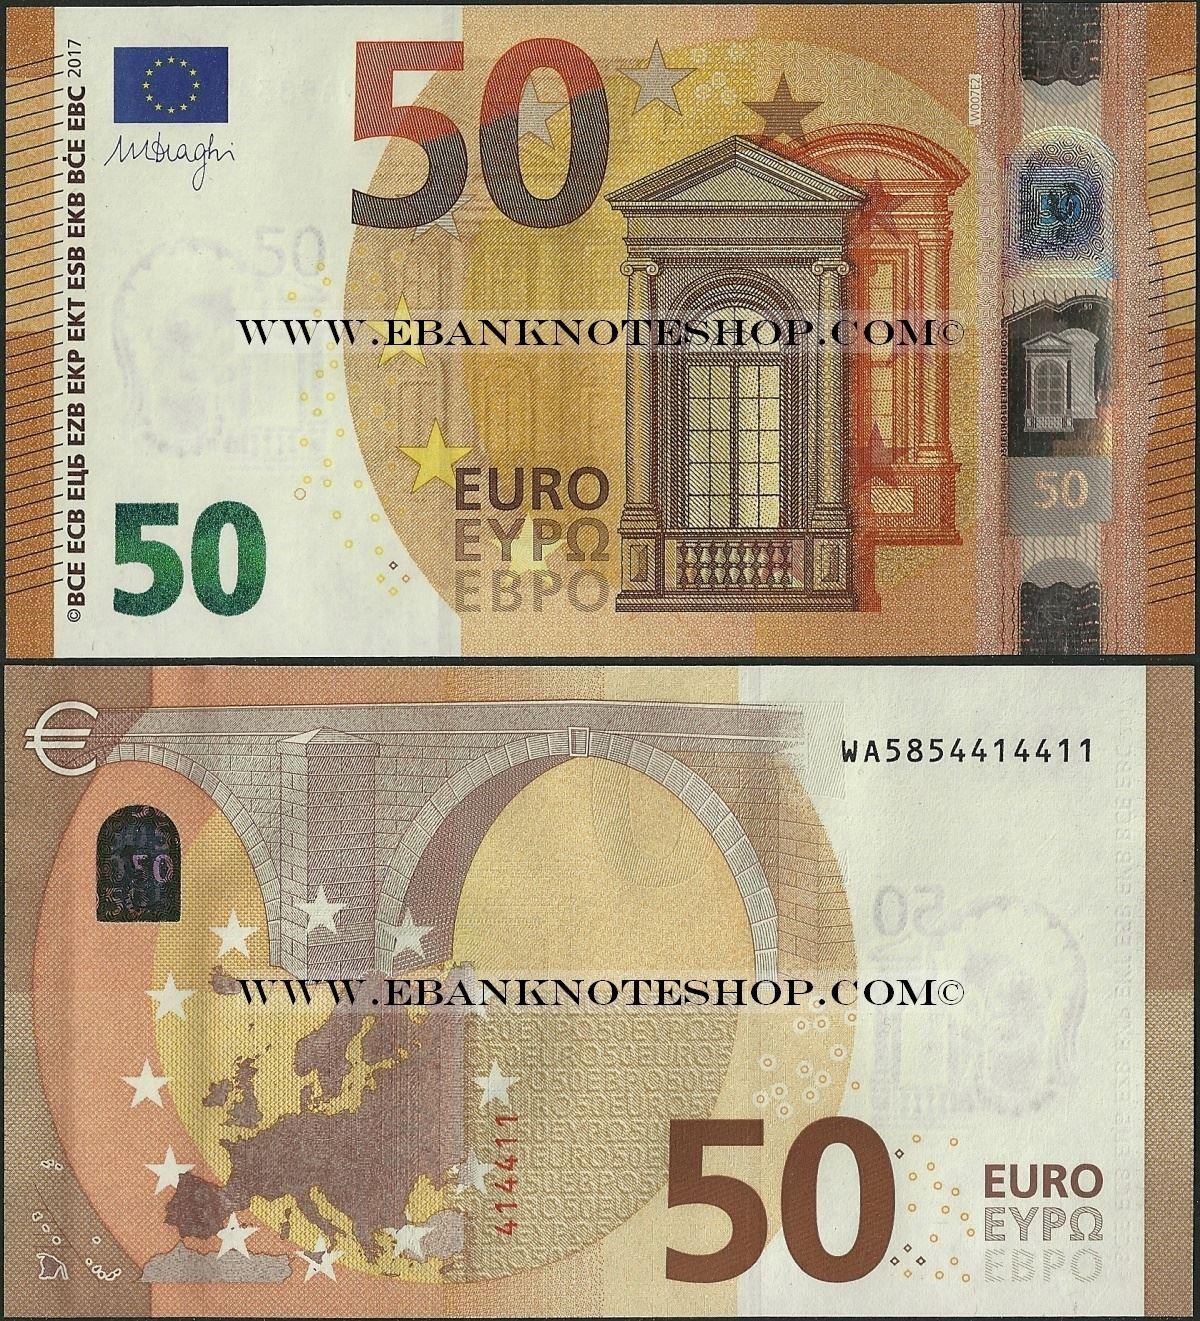 ebanknoteshop euro p23 b111w3 germany 50 euros 2017. Black Bedroom Furniture Sets. Home Design Ideas